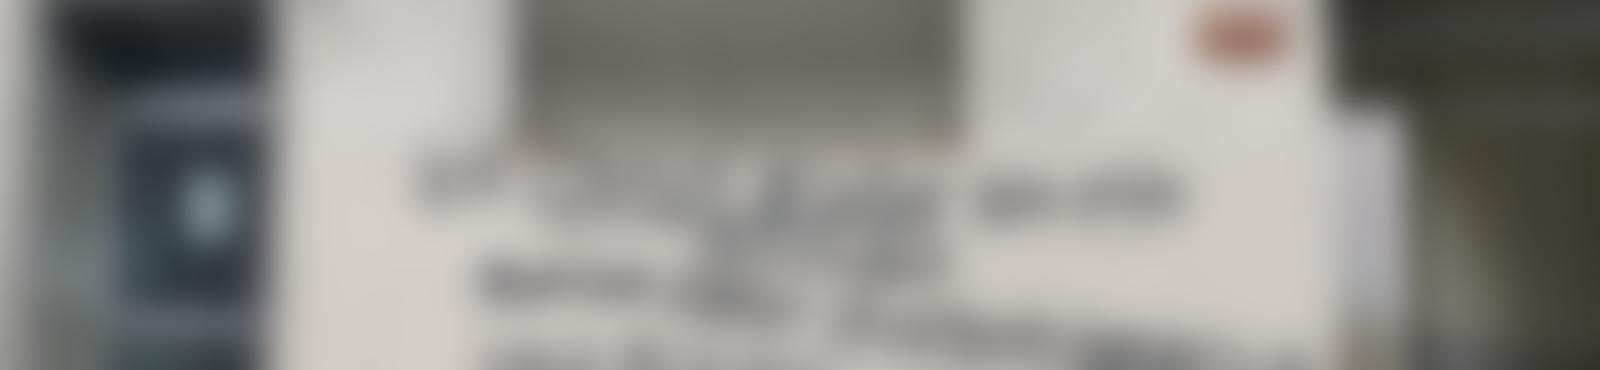 Blurred 97efabd8 527e 4038 9538 a759df970d97